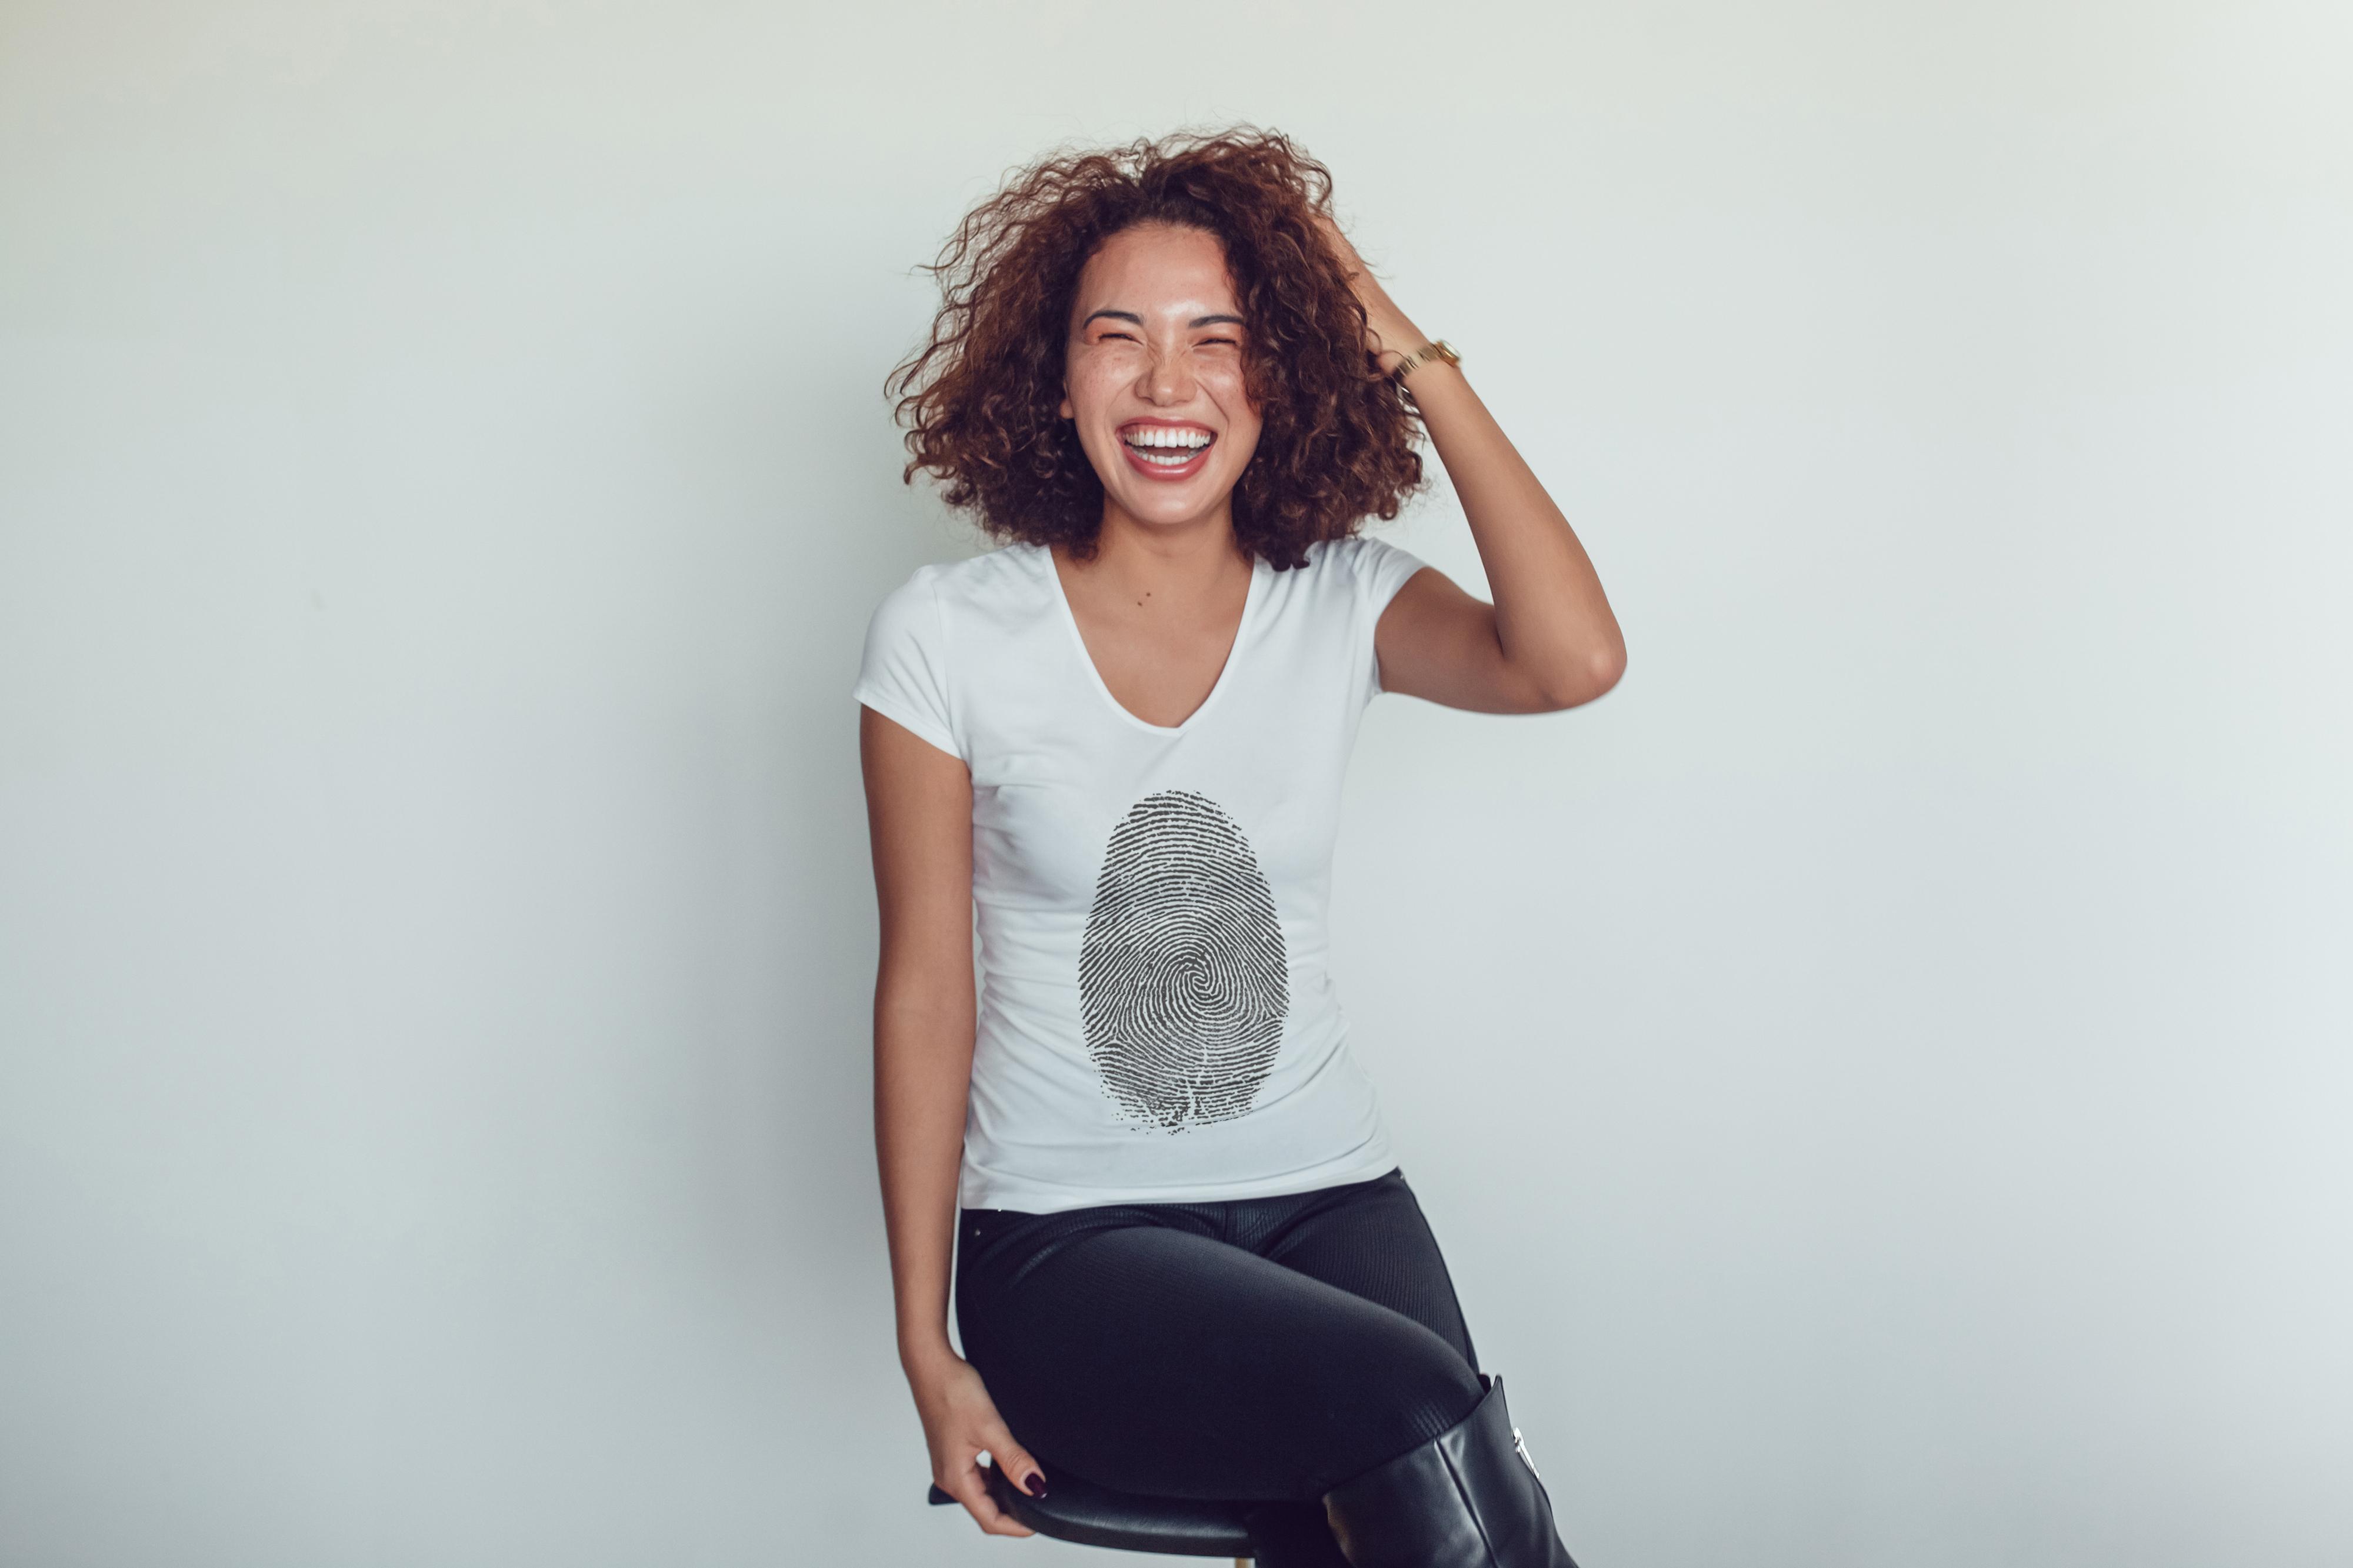 T-Shirt Mock-Up Vol.19 2017 example image 23